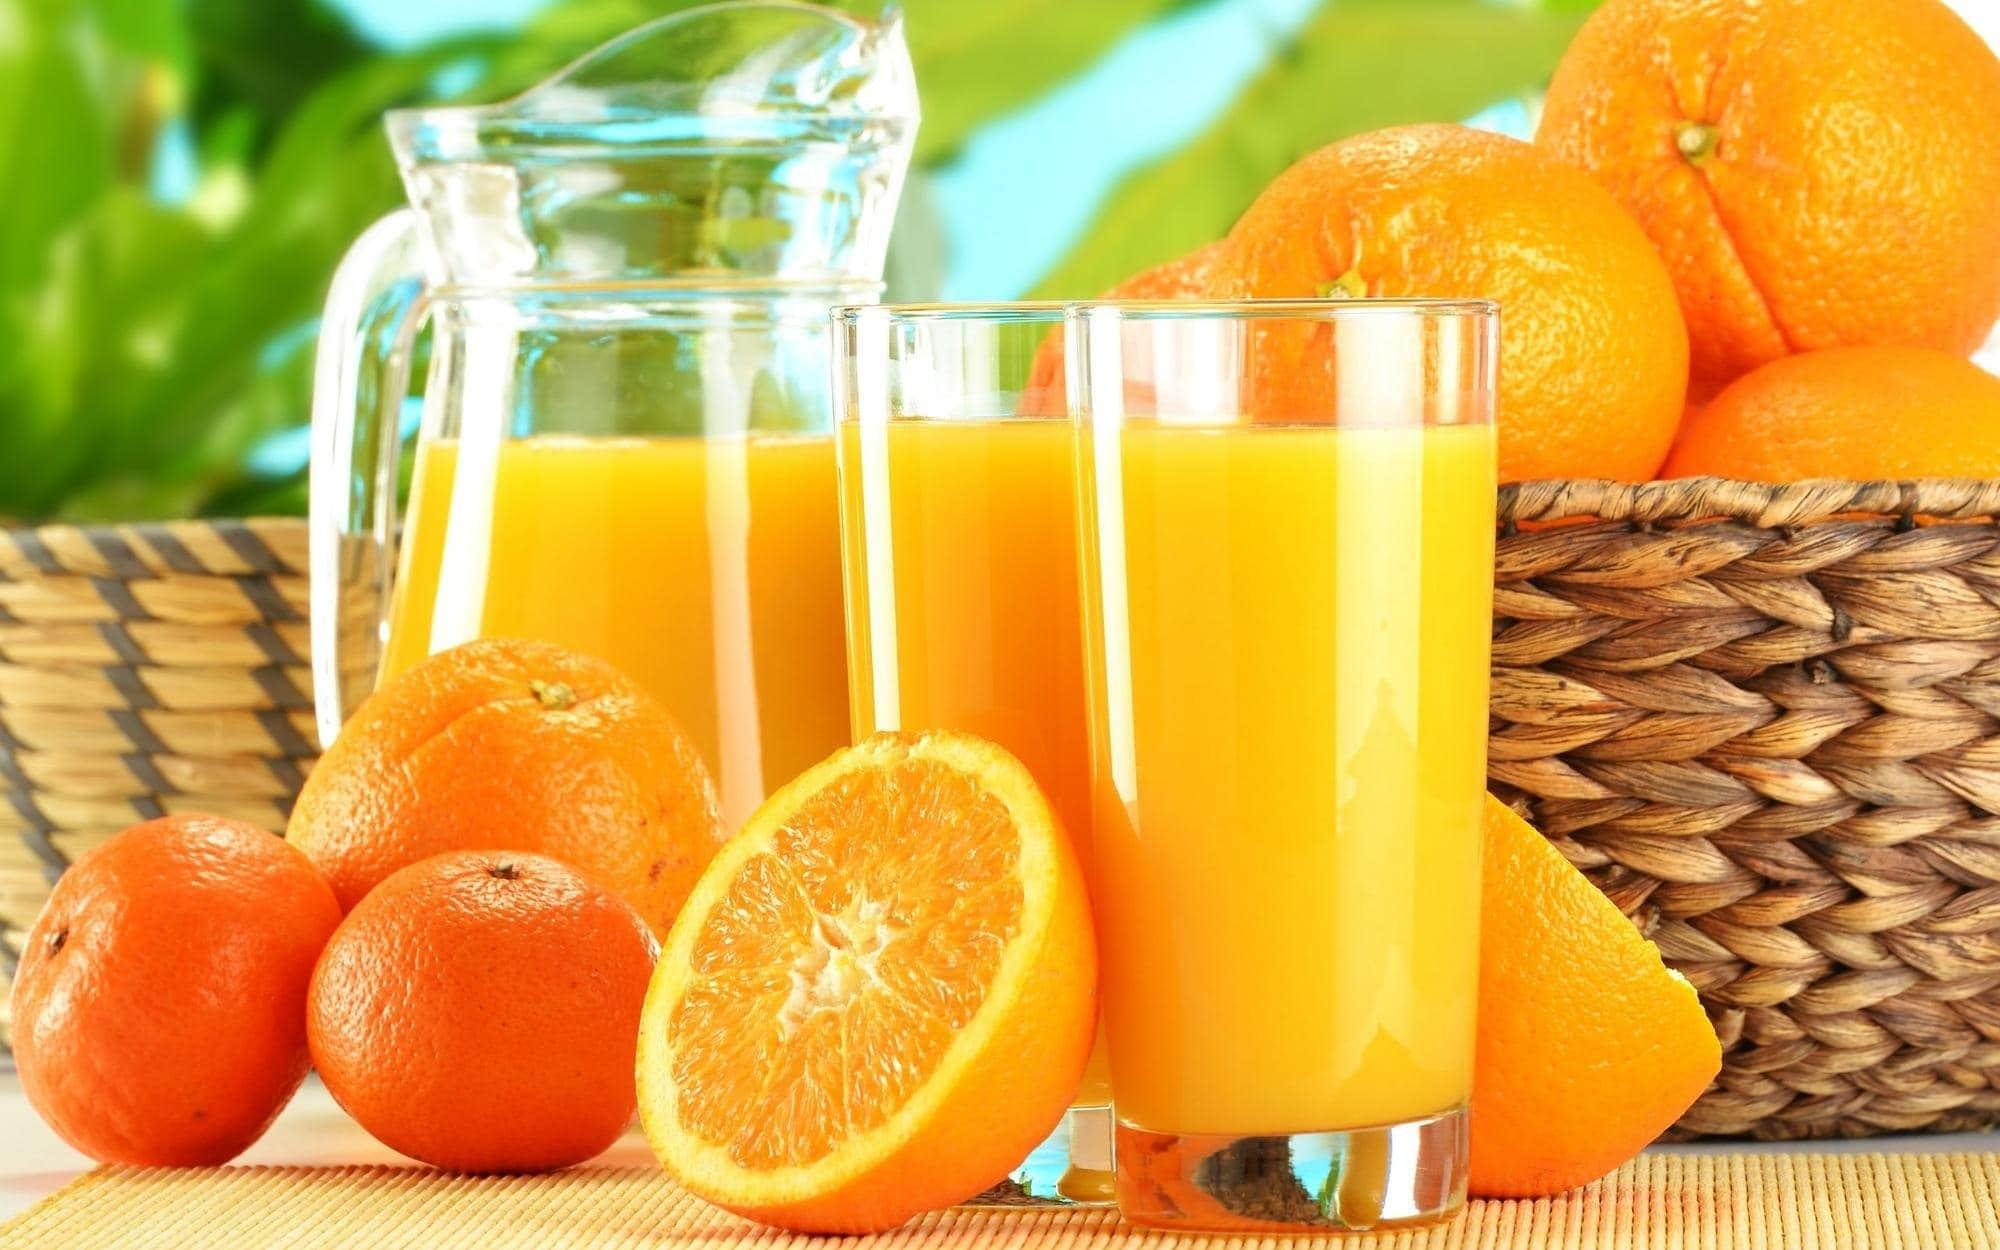 juice dream meaning, dream about juice, juice dream interpretation, seeing in a dream juice